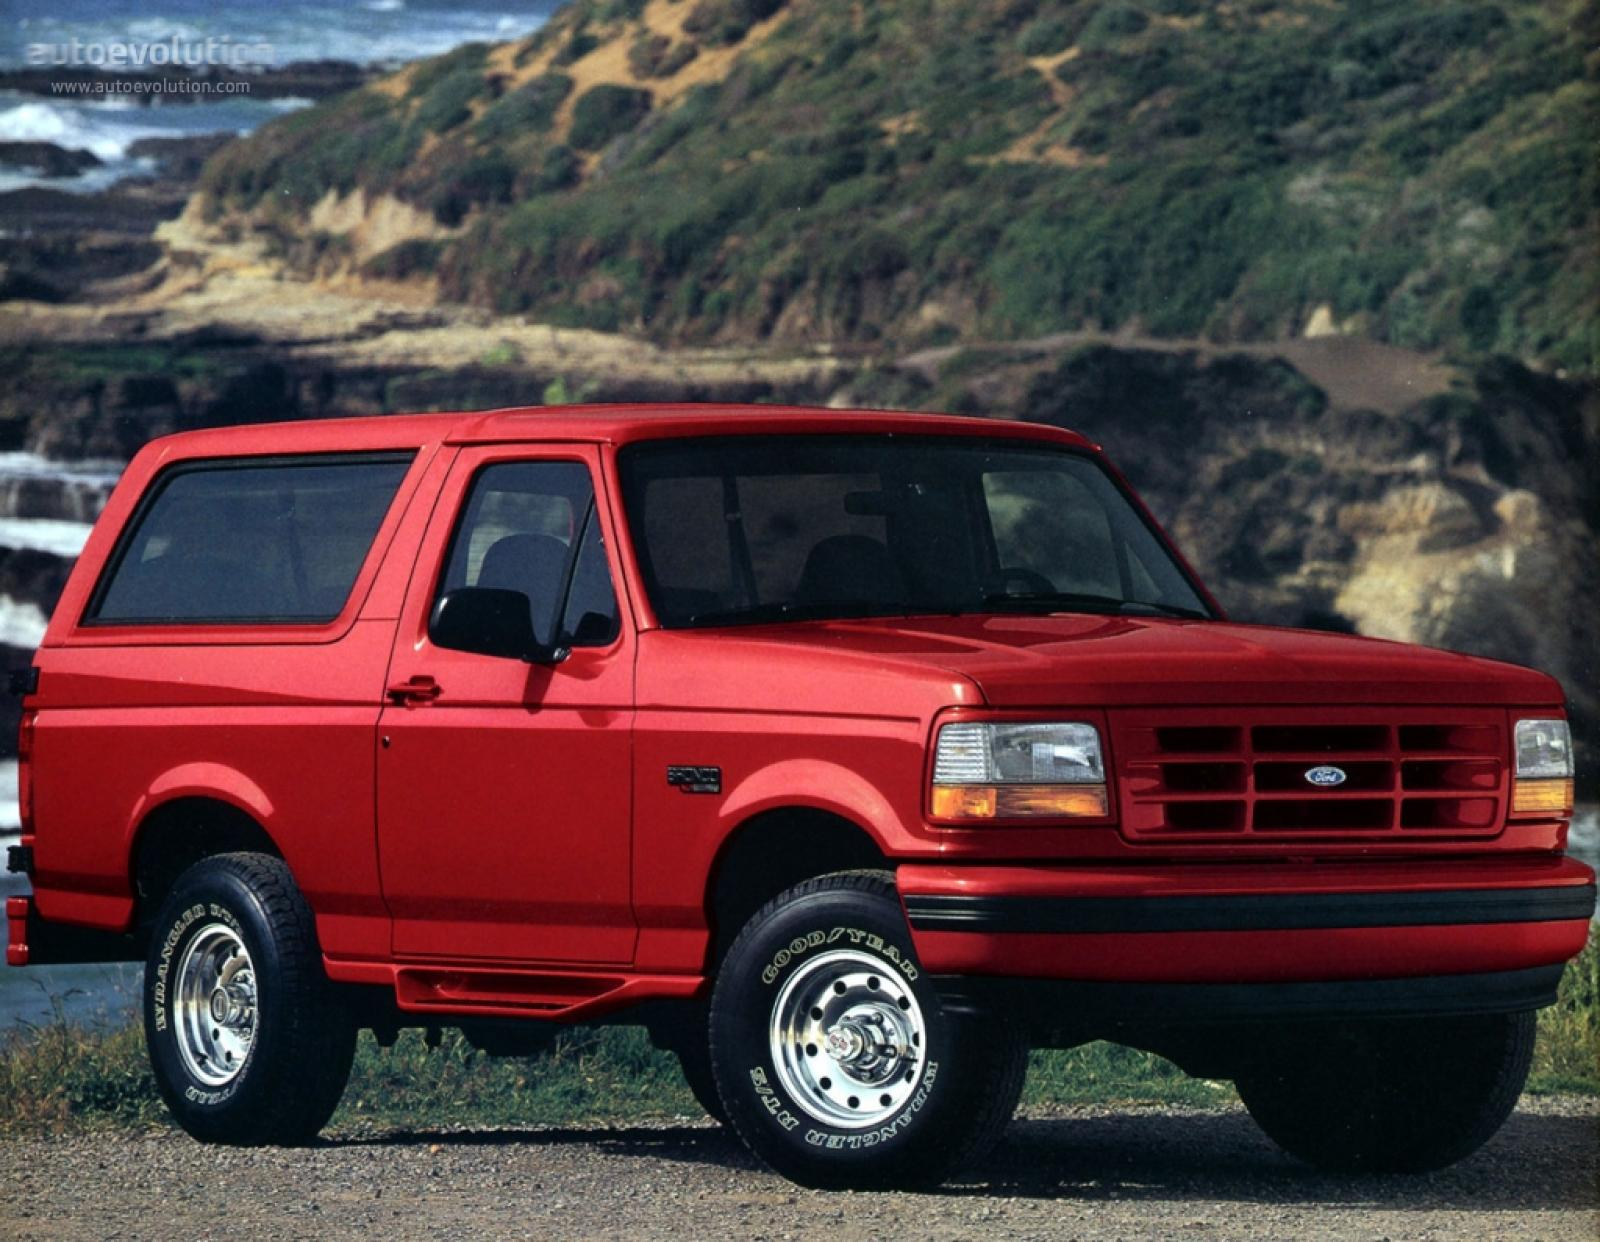 1996 Ford Bronco Information And Photos Zombiedrive 1995 Fuse Box Diagram 800 1024 1280 1600 Origin